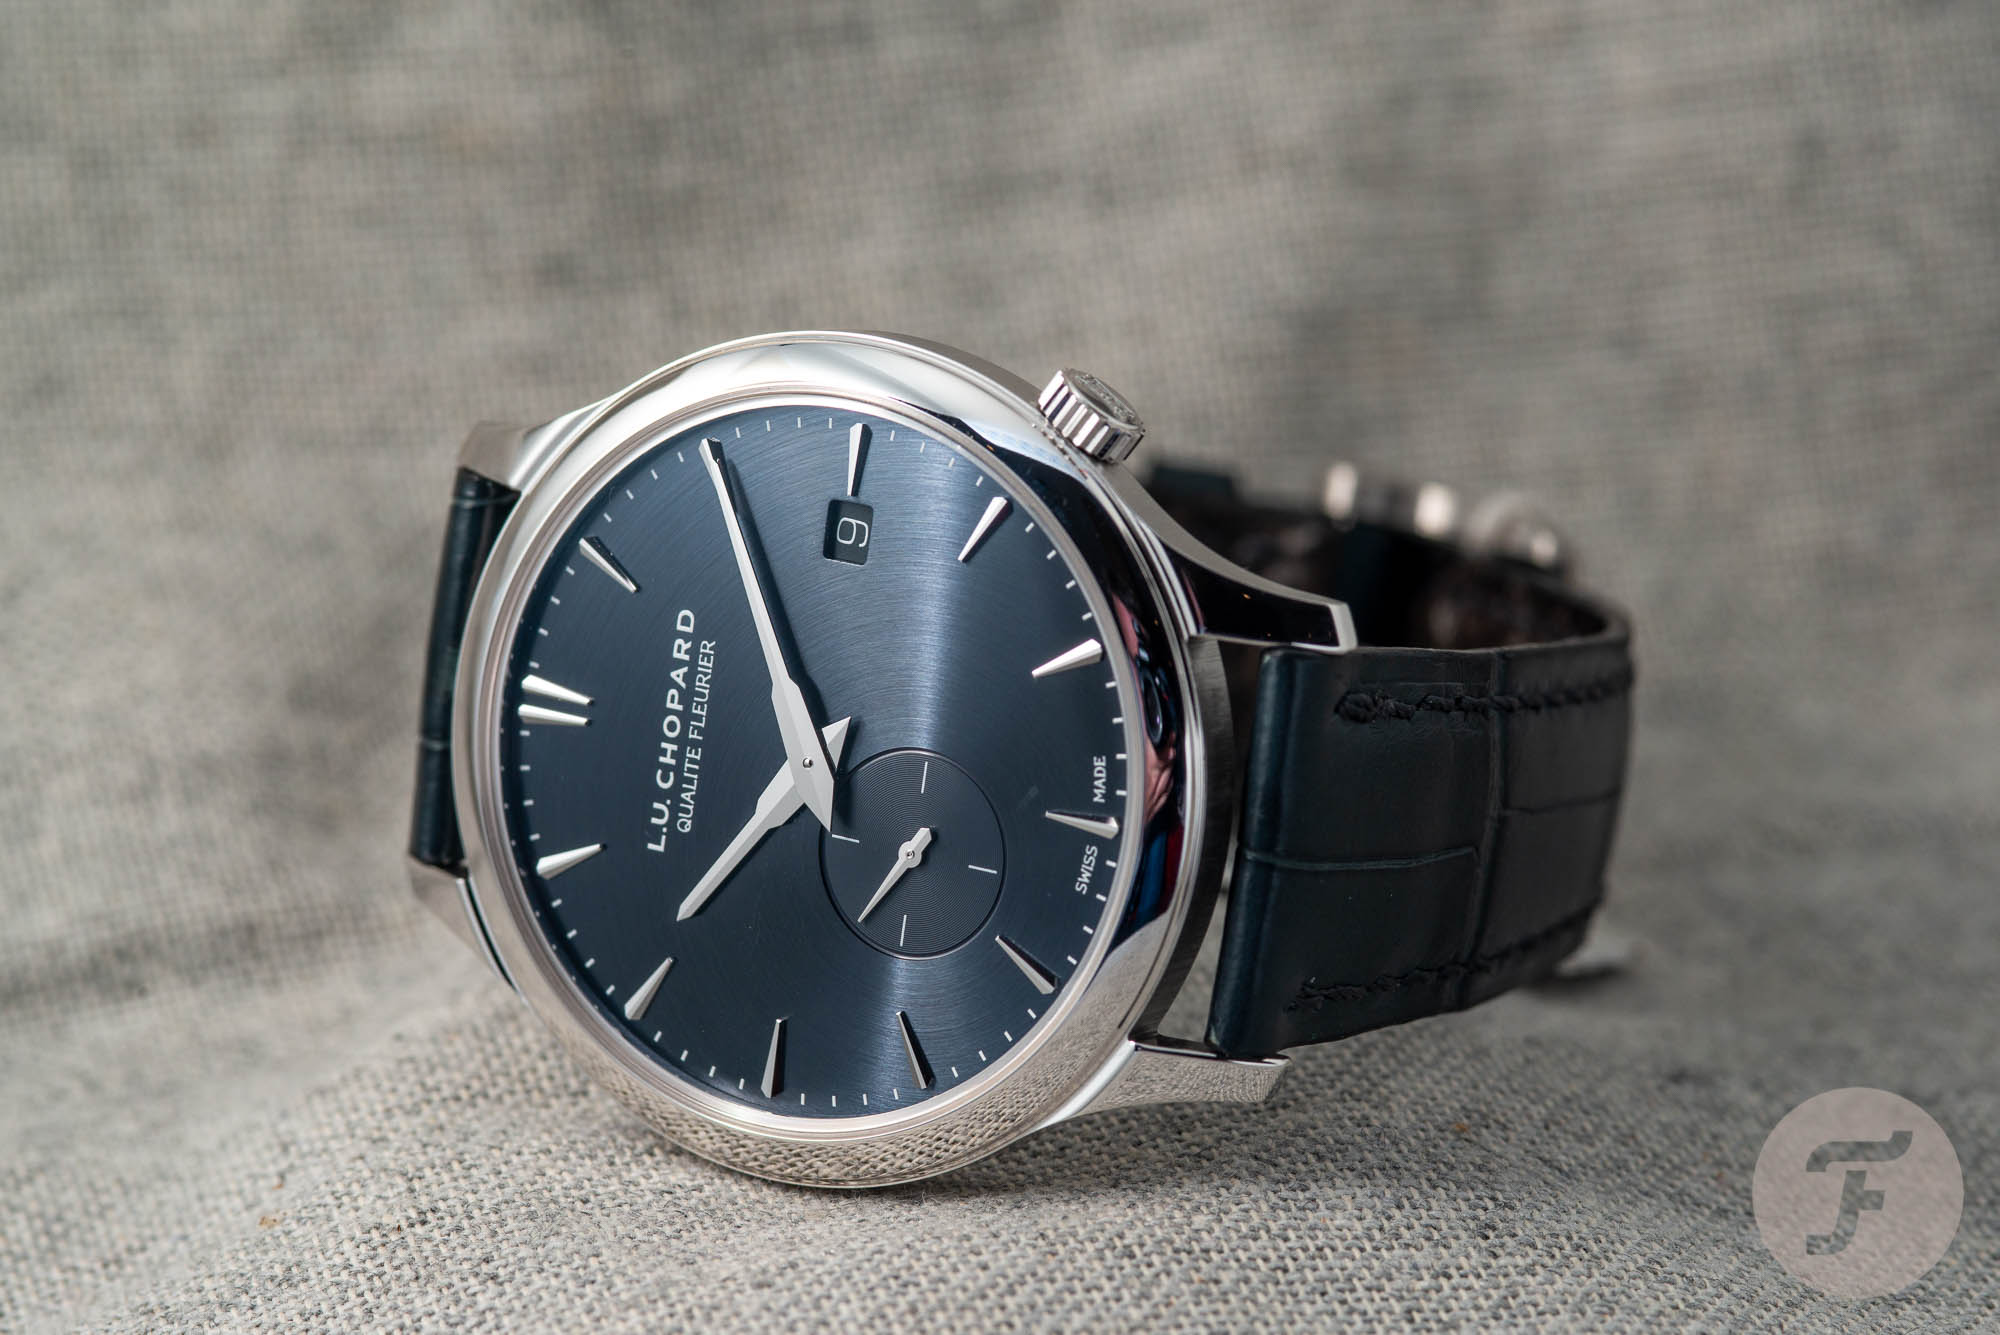 Chopard LUC XPS Twist QF Top 10 Dress Watches